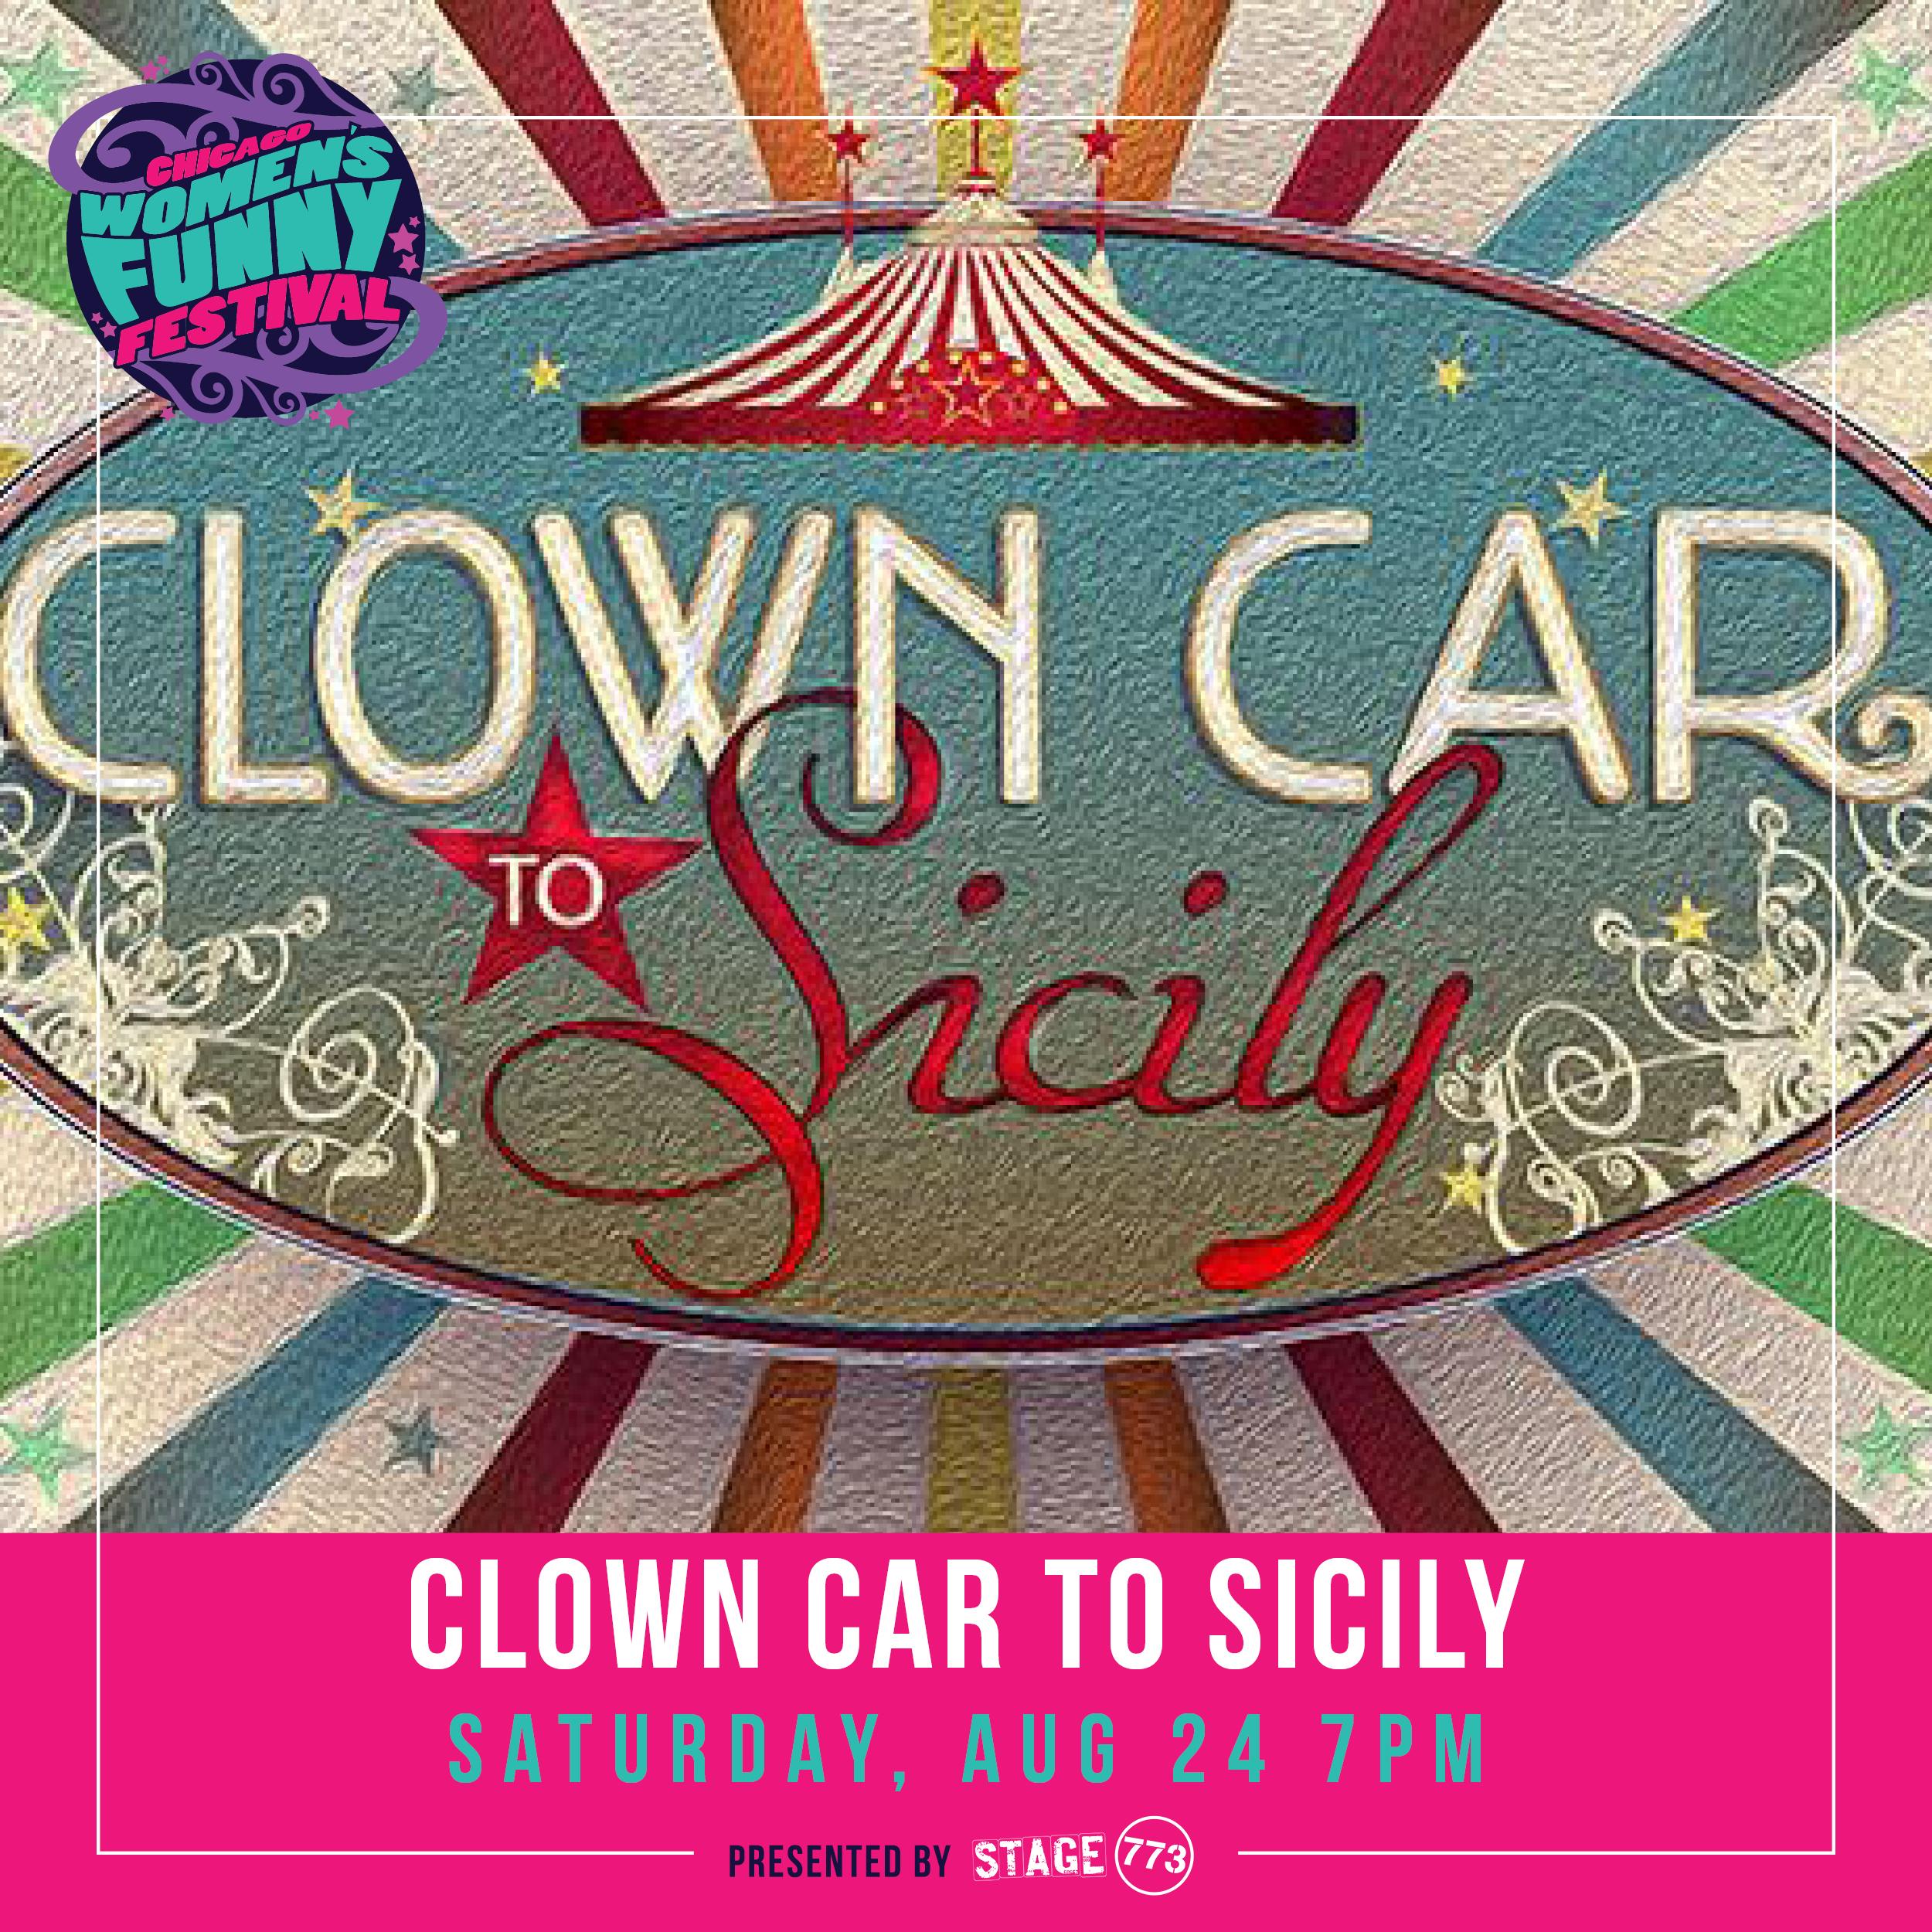 ClownCartoSicily_Saturday_7PM_CWFF20194.jpg